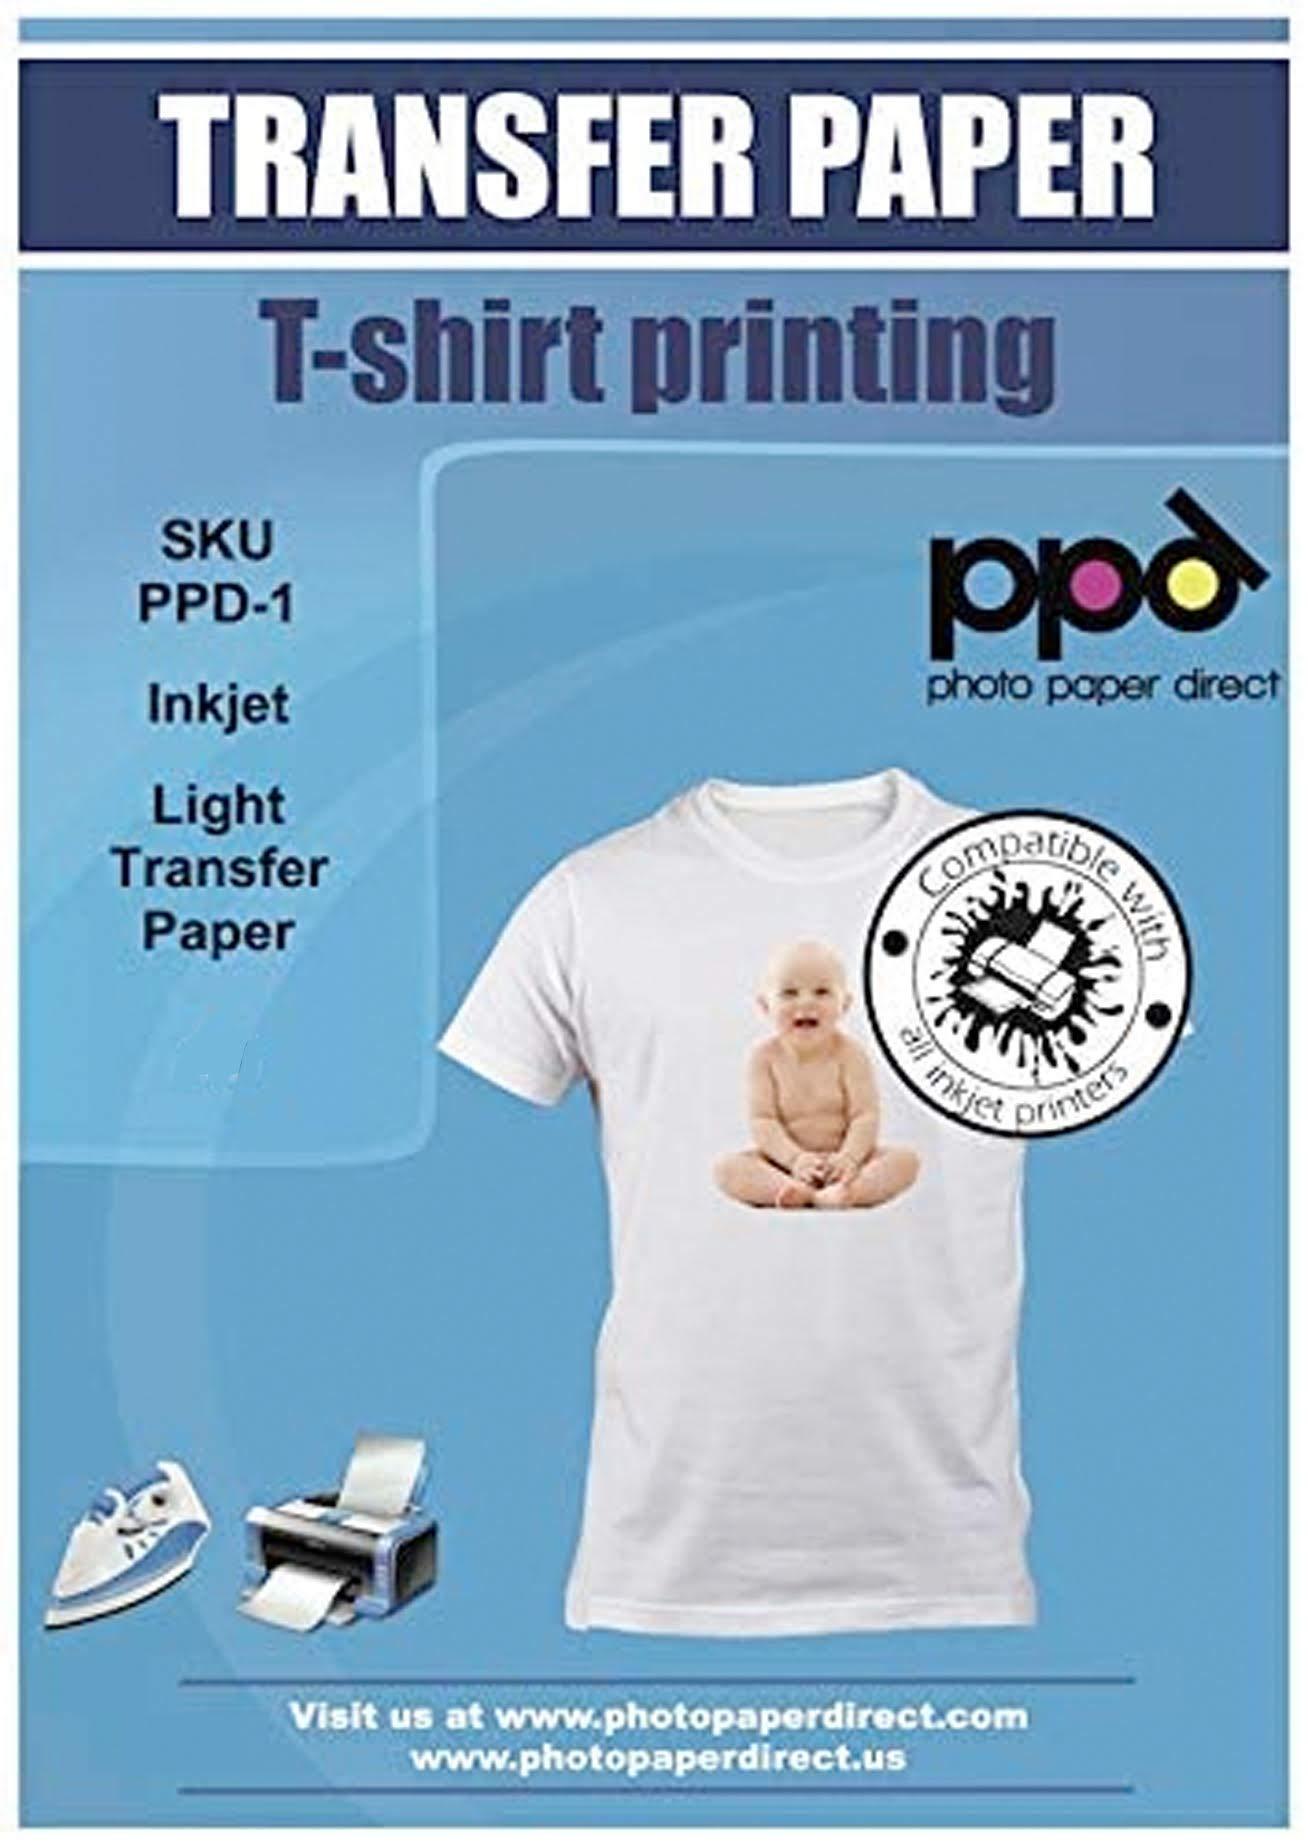 "PPD Inkjet Iron-On Light T Shirt Transfer Paper LTR 8.5x11"" Pack of 100 Sheets (PPD001-100)"